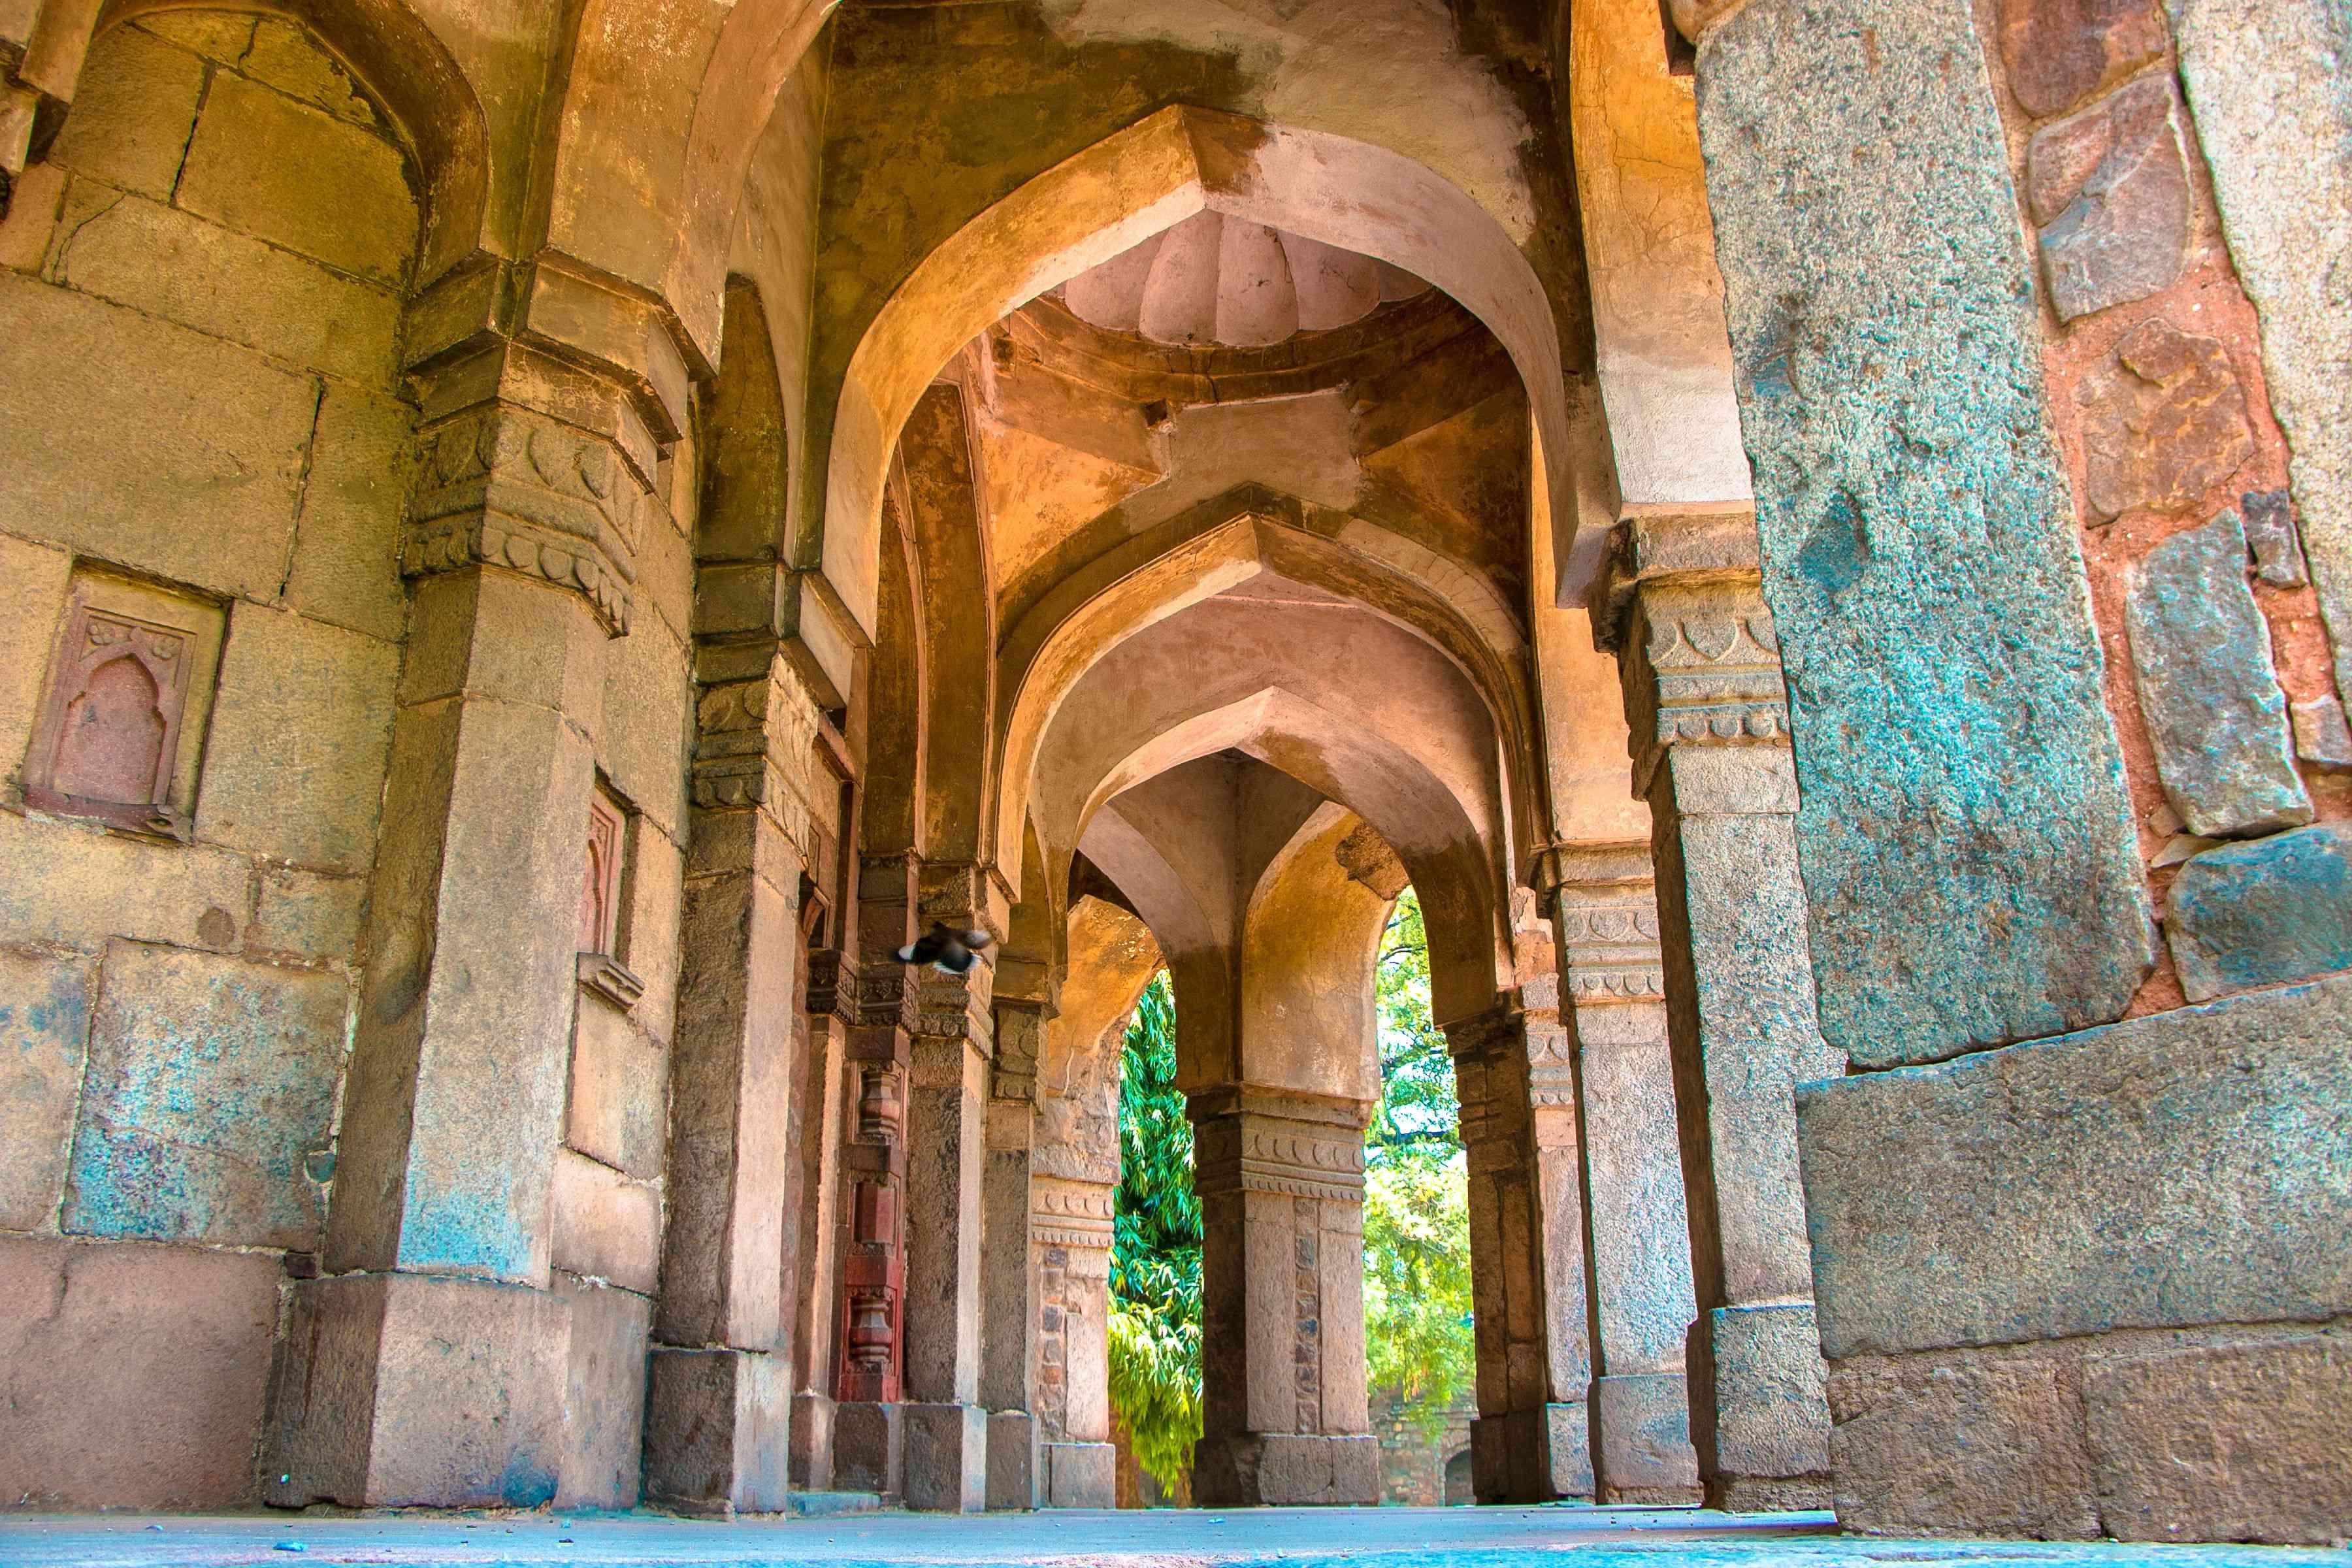 Gateway and Mosque in Lodhi Garden